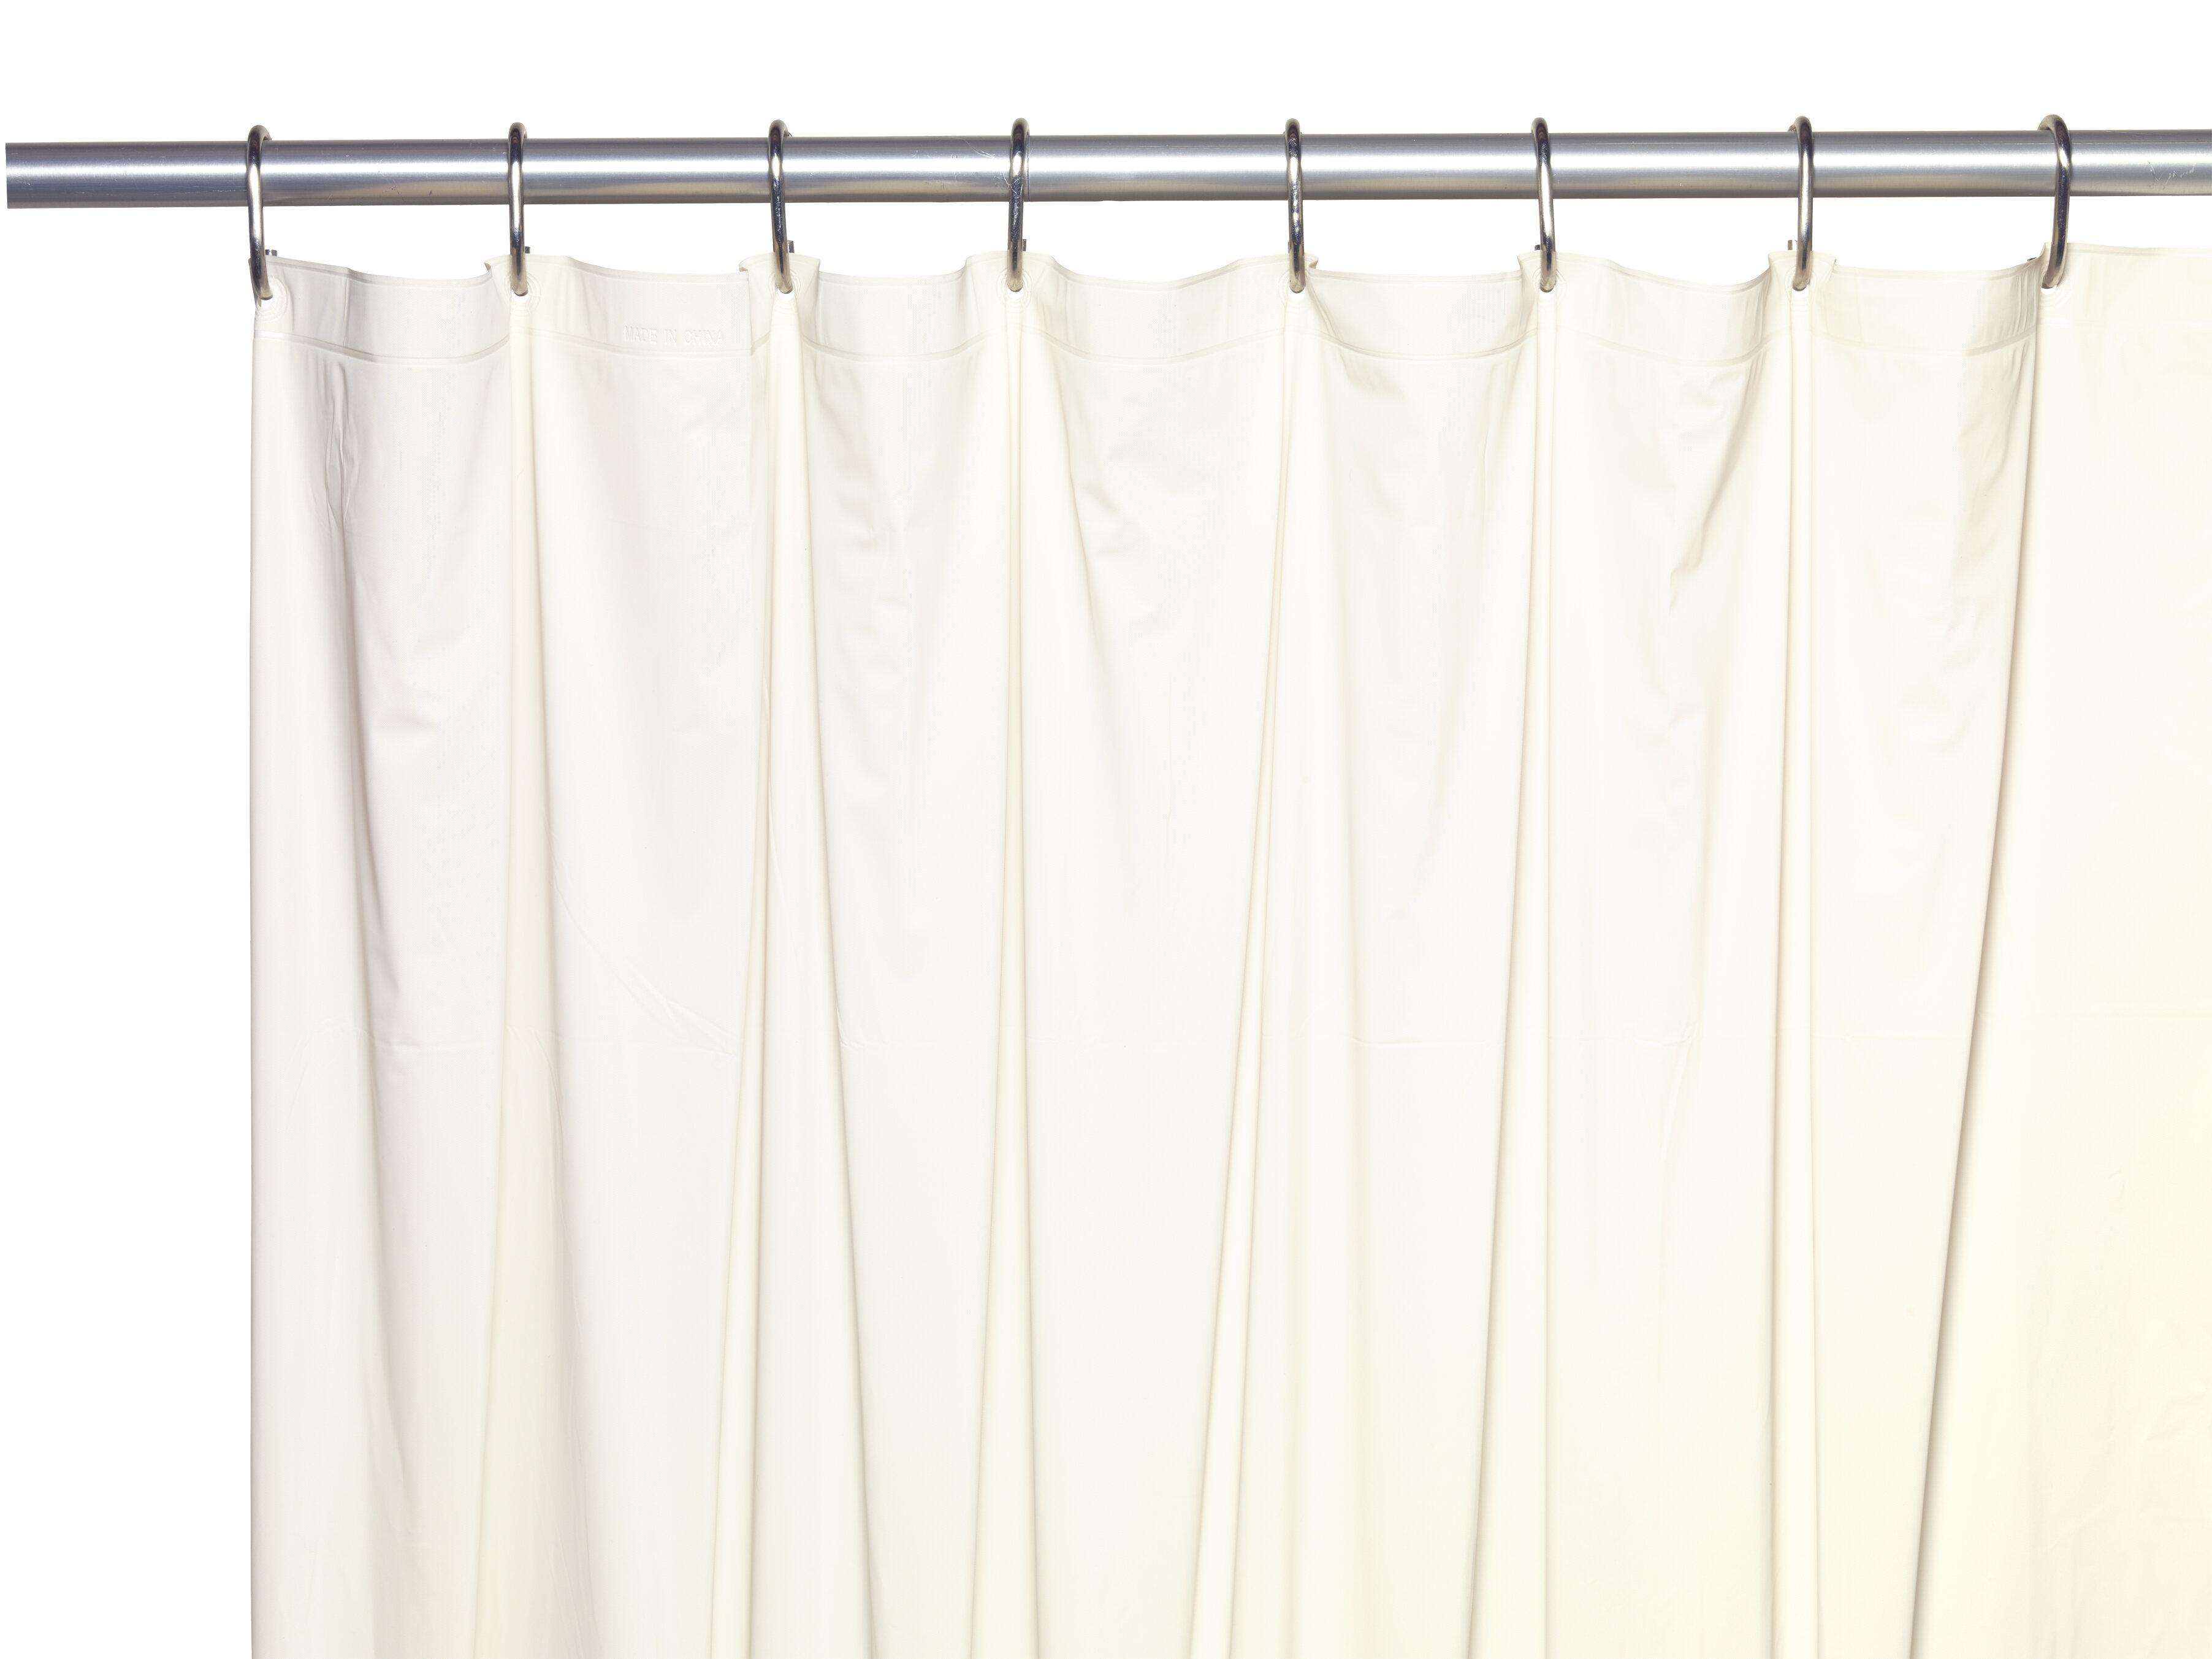 Symple Stuff 5 Gauge Vinyl Single Shower Curtain Liner Reviews